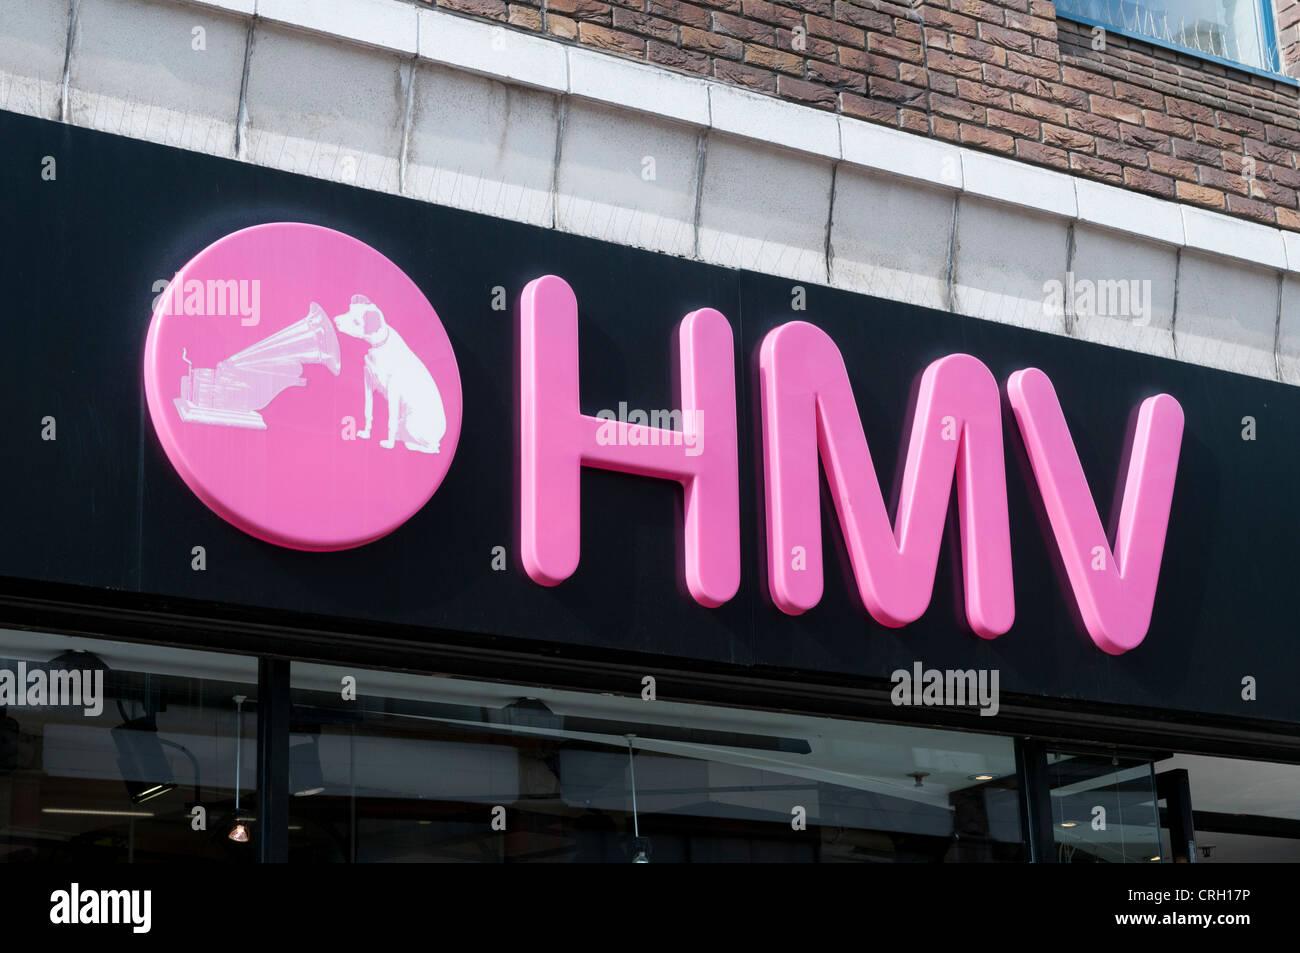 Hmv Store Logo Stock Photo 48932010 Alamy